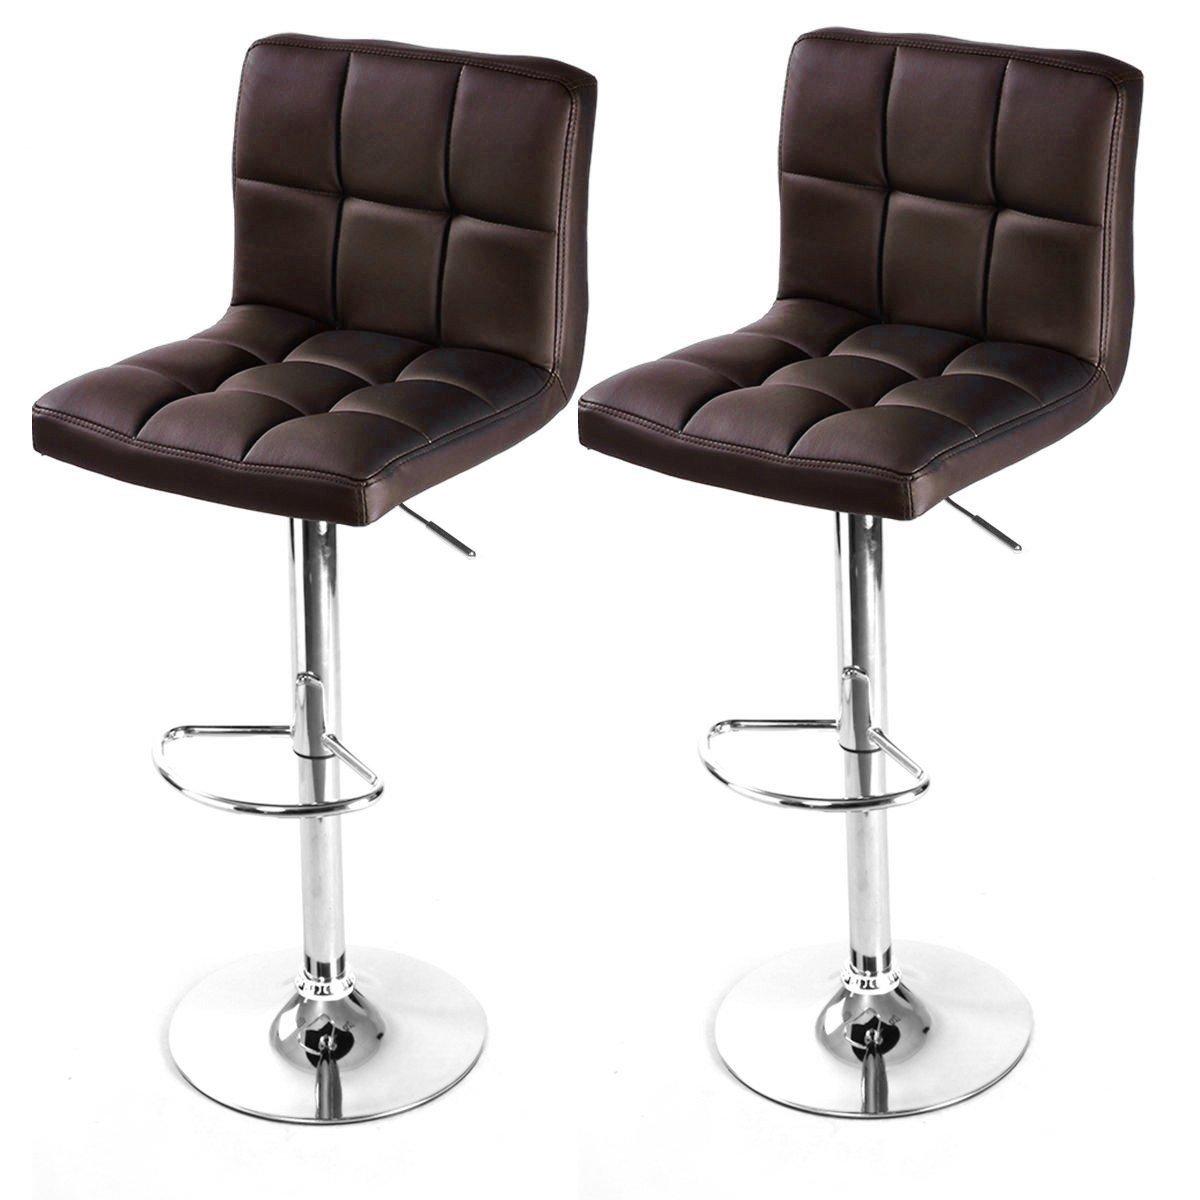 Pics photos bar stools for sale - Amazon Com 2 Modern Adjustable Leather Swivel Pub Style Bar Stools Barstools Brown Kitchen Dining